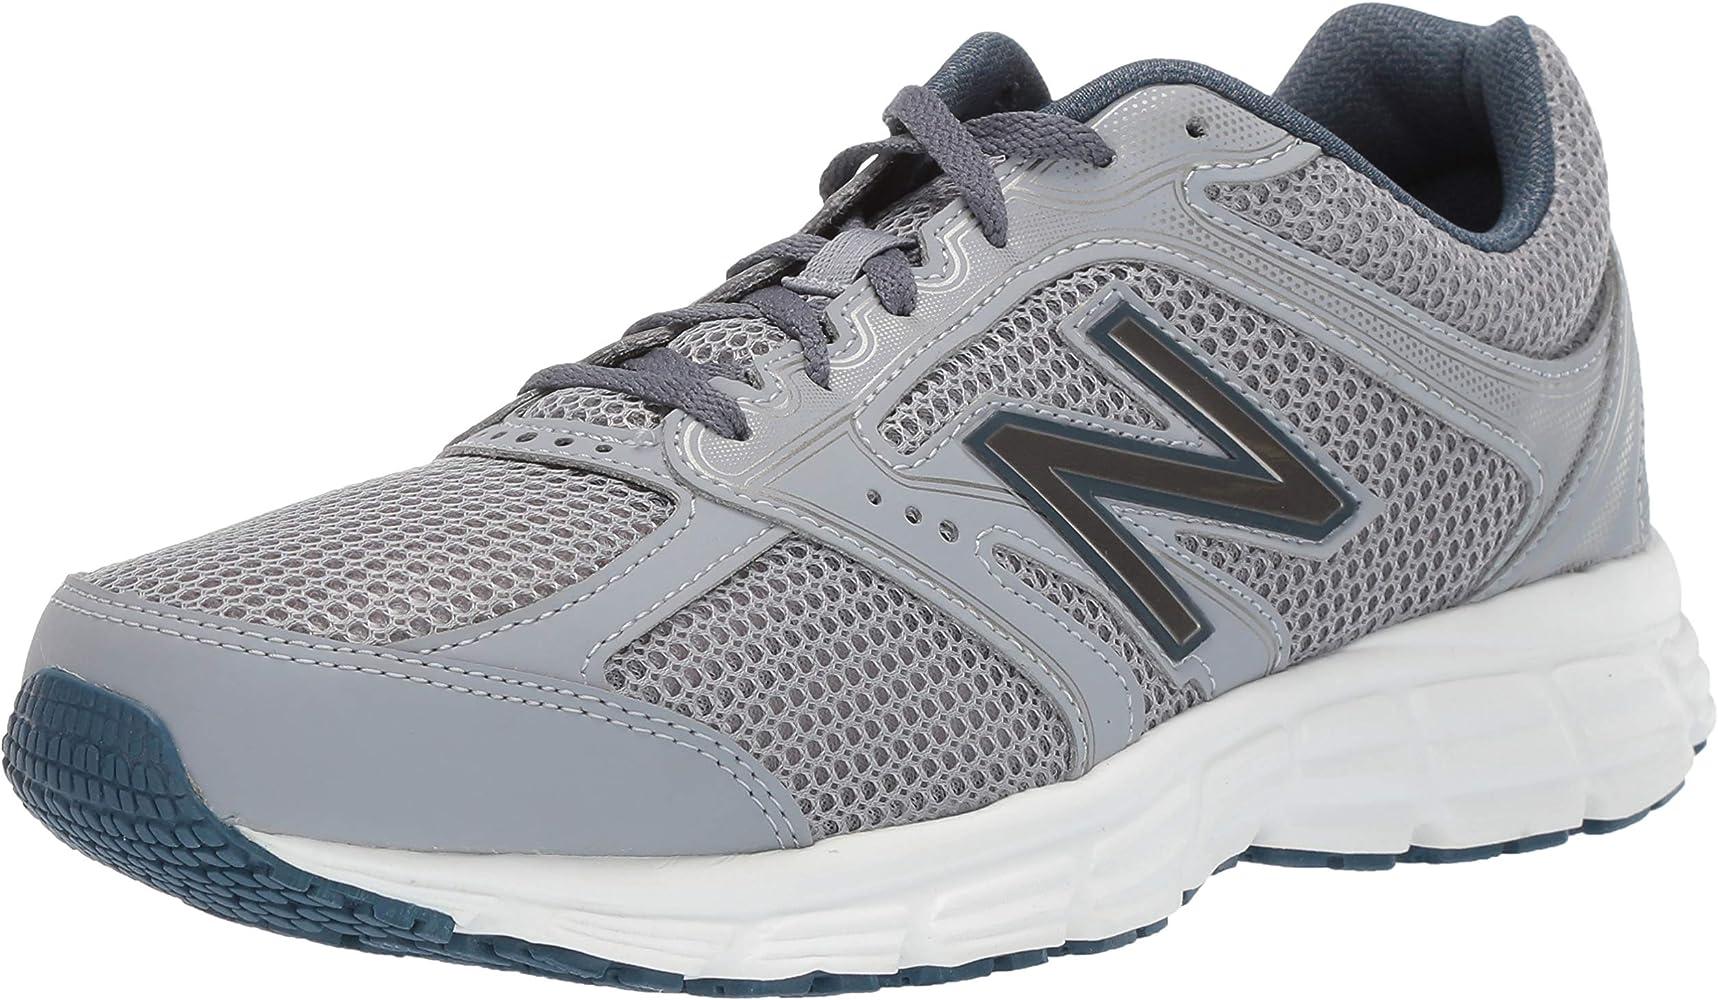 brand new 1749a 0e148 Men's 460v2 Cushioning Running Shoe, Steel/North sea, 15 4E US